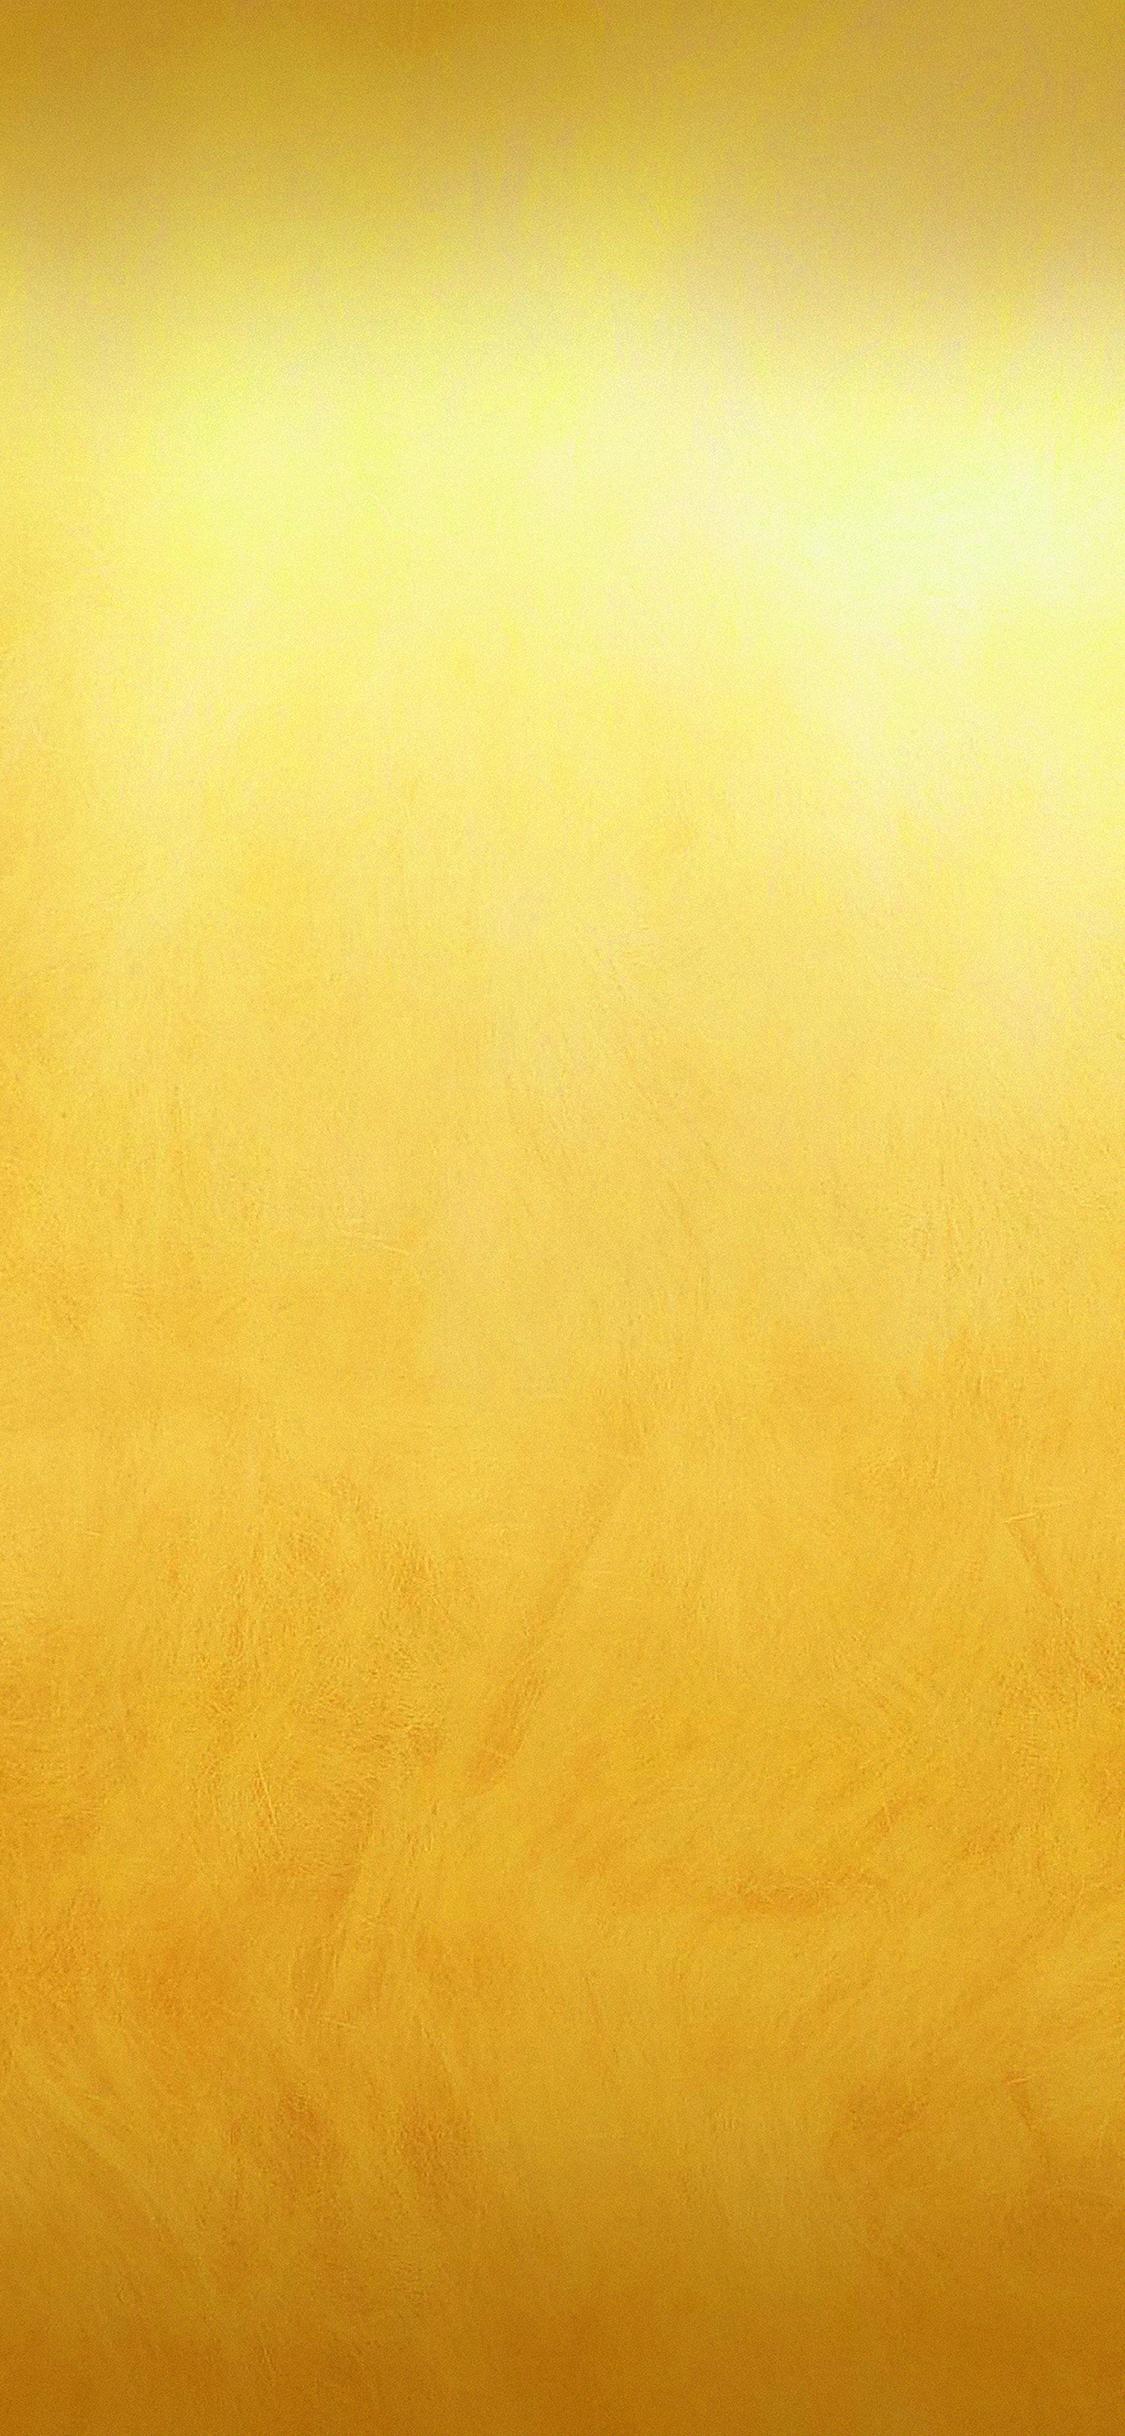 iPhoneXpapers.com-Apple-iPhone-wallpaper-vb56-wallpaper-astratto-carta-ocean-gold-pattern